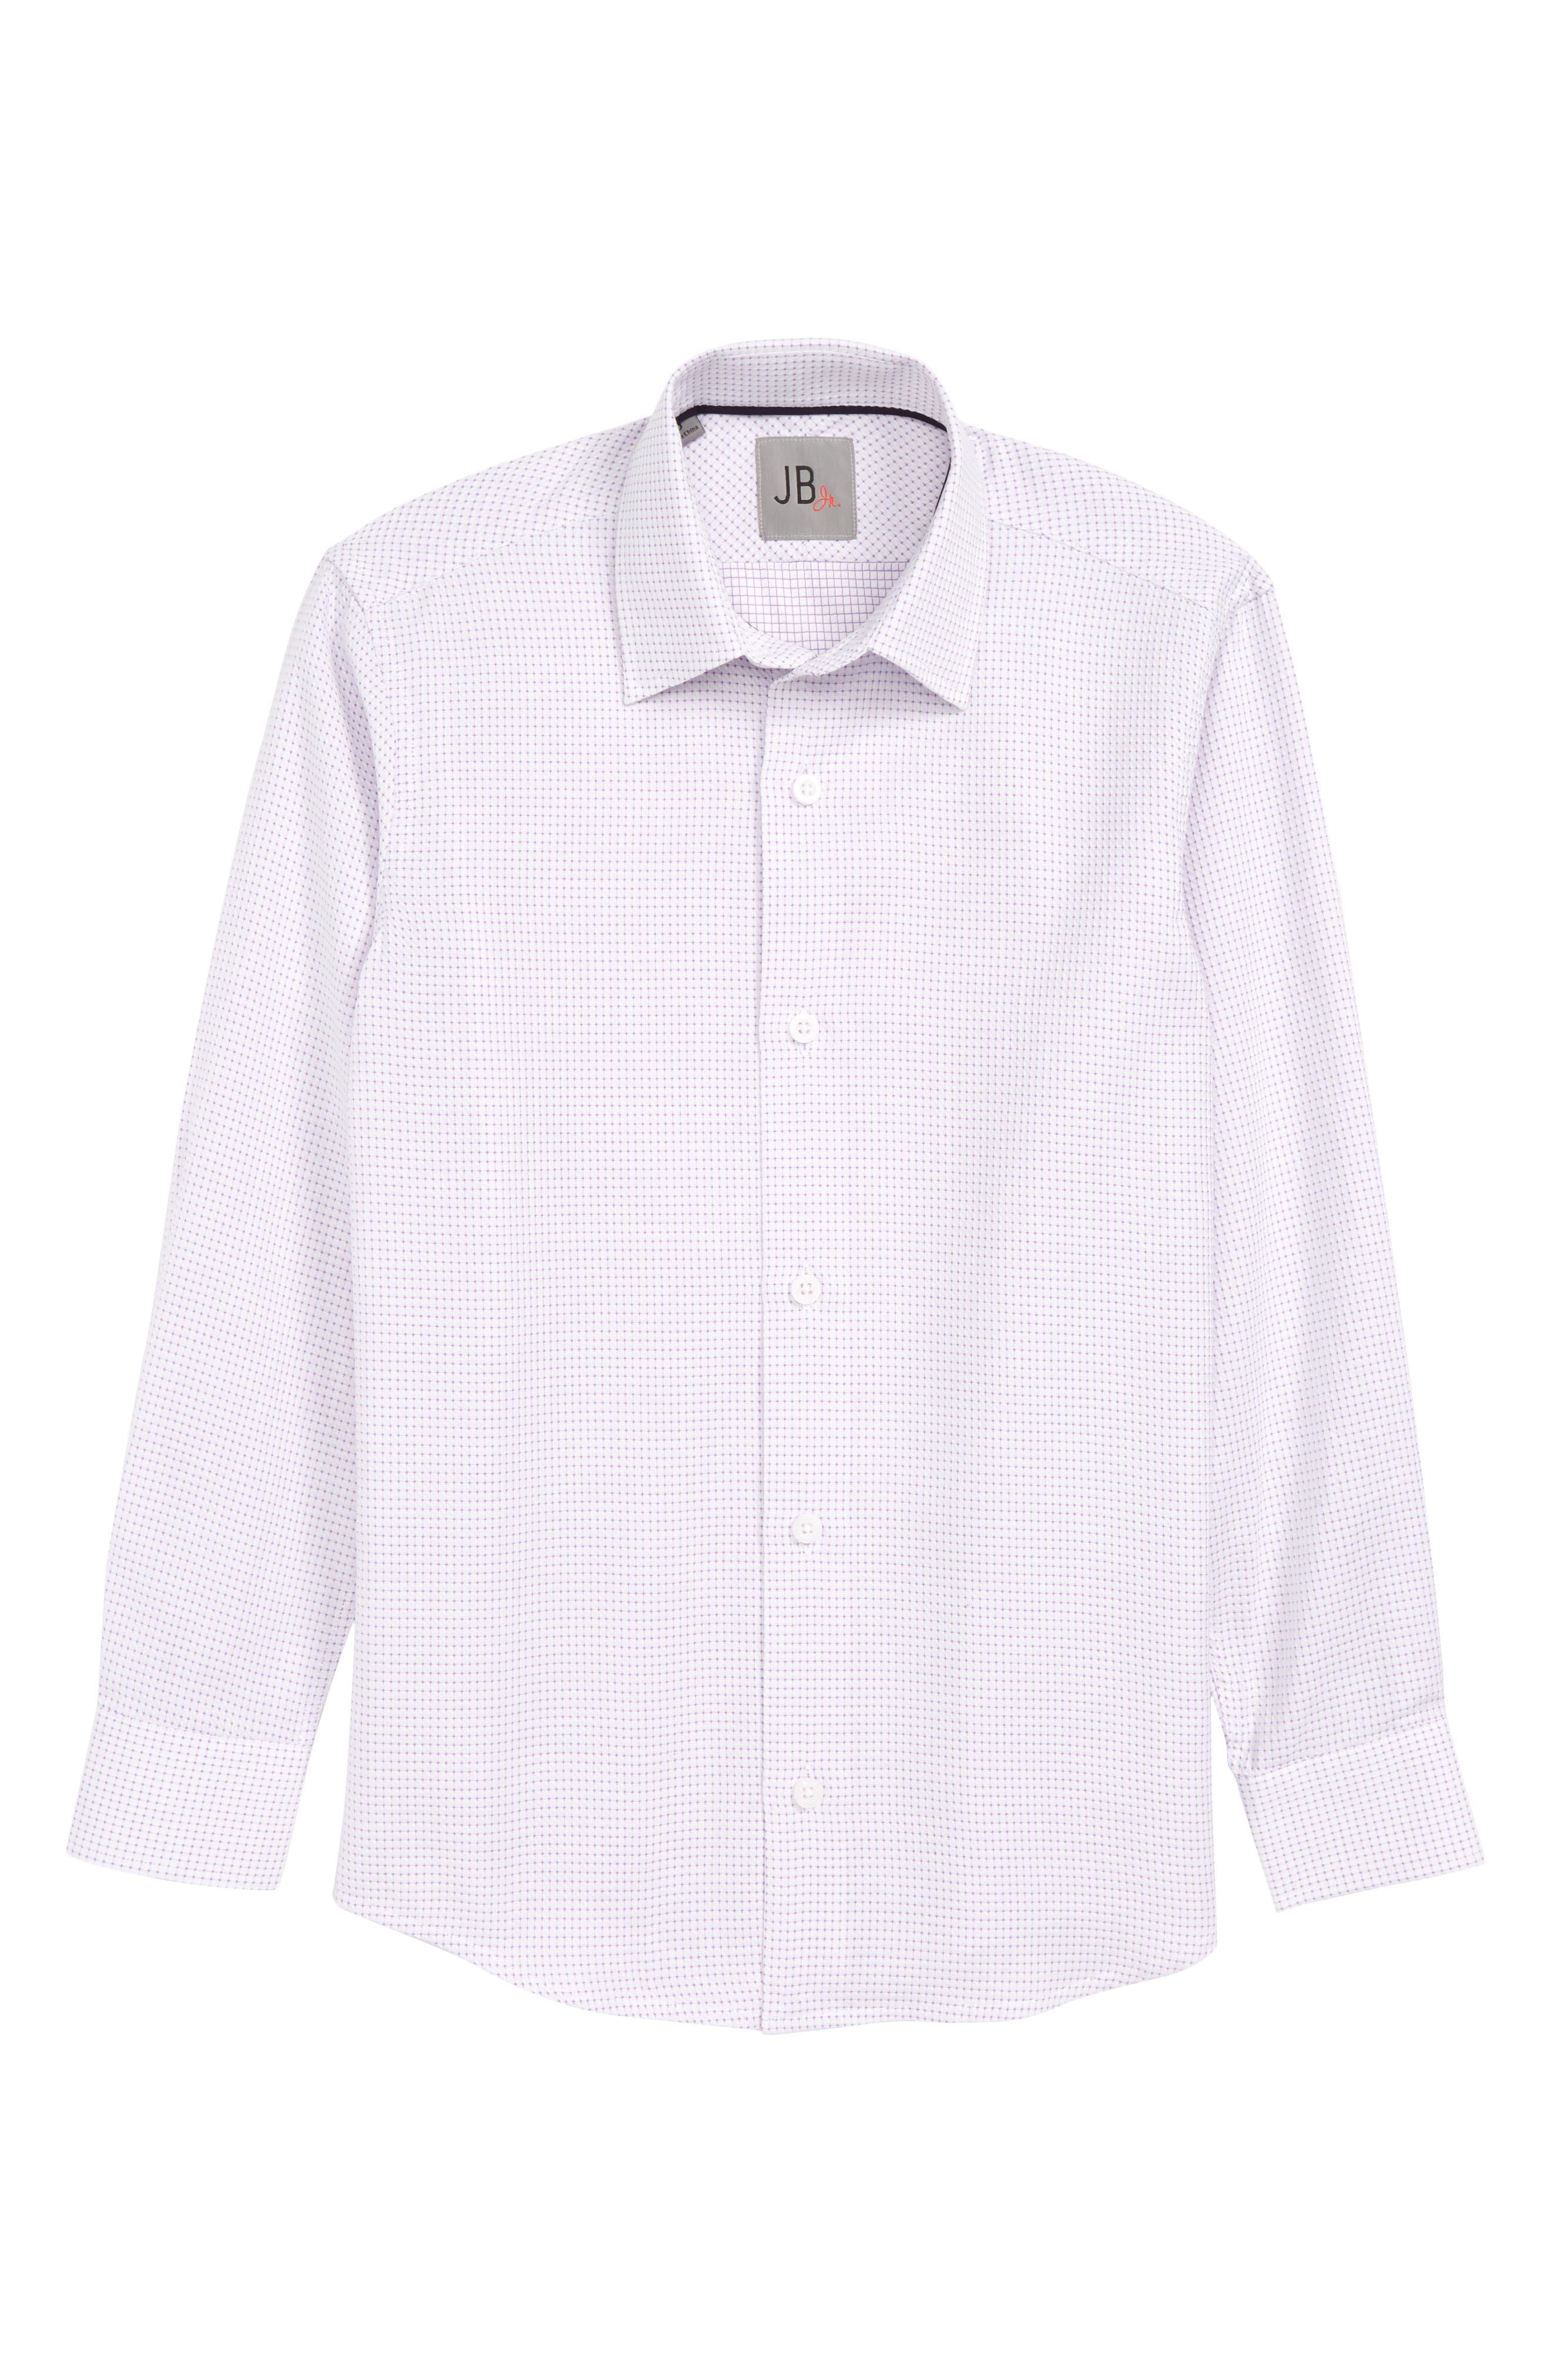 JB JR Check Dress Shirt, Main, color, LAVENDER